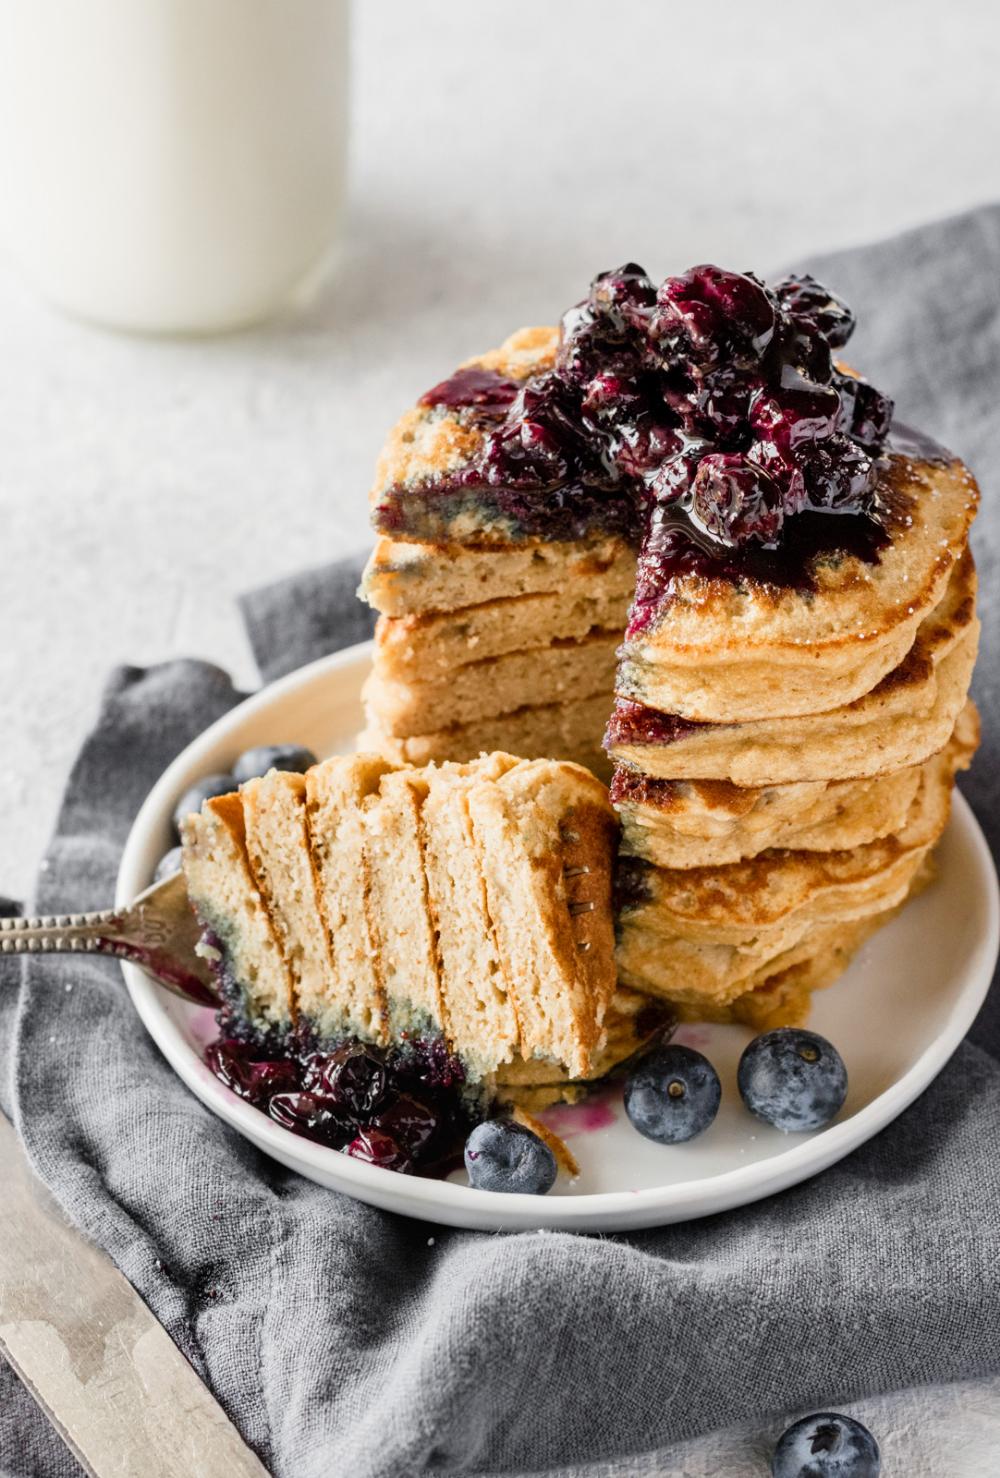 The Best Fluffy Coconut Flour Pancakes Ambitious Kitchen Recipe Coconut Flour Pancakes Coconut Flour Coconut Flour Recipes